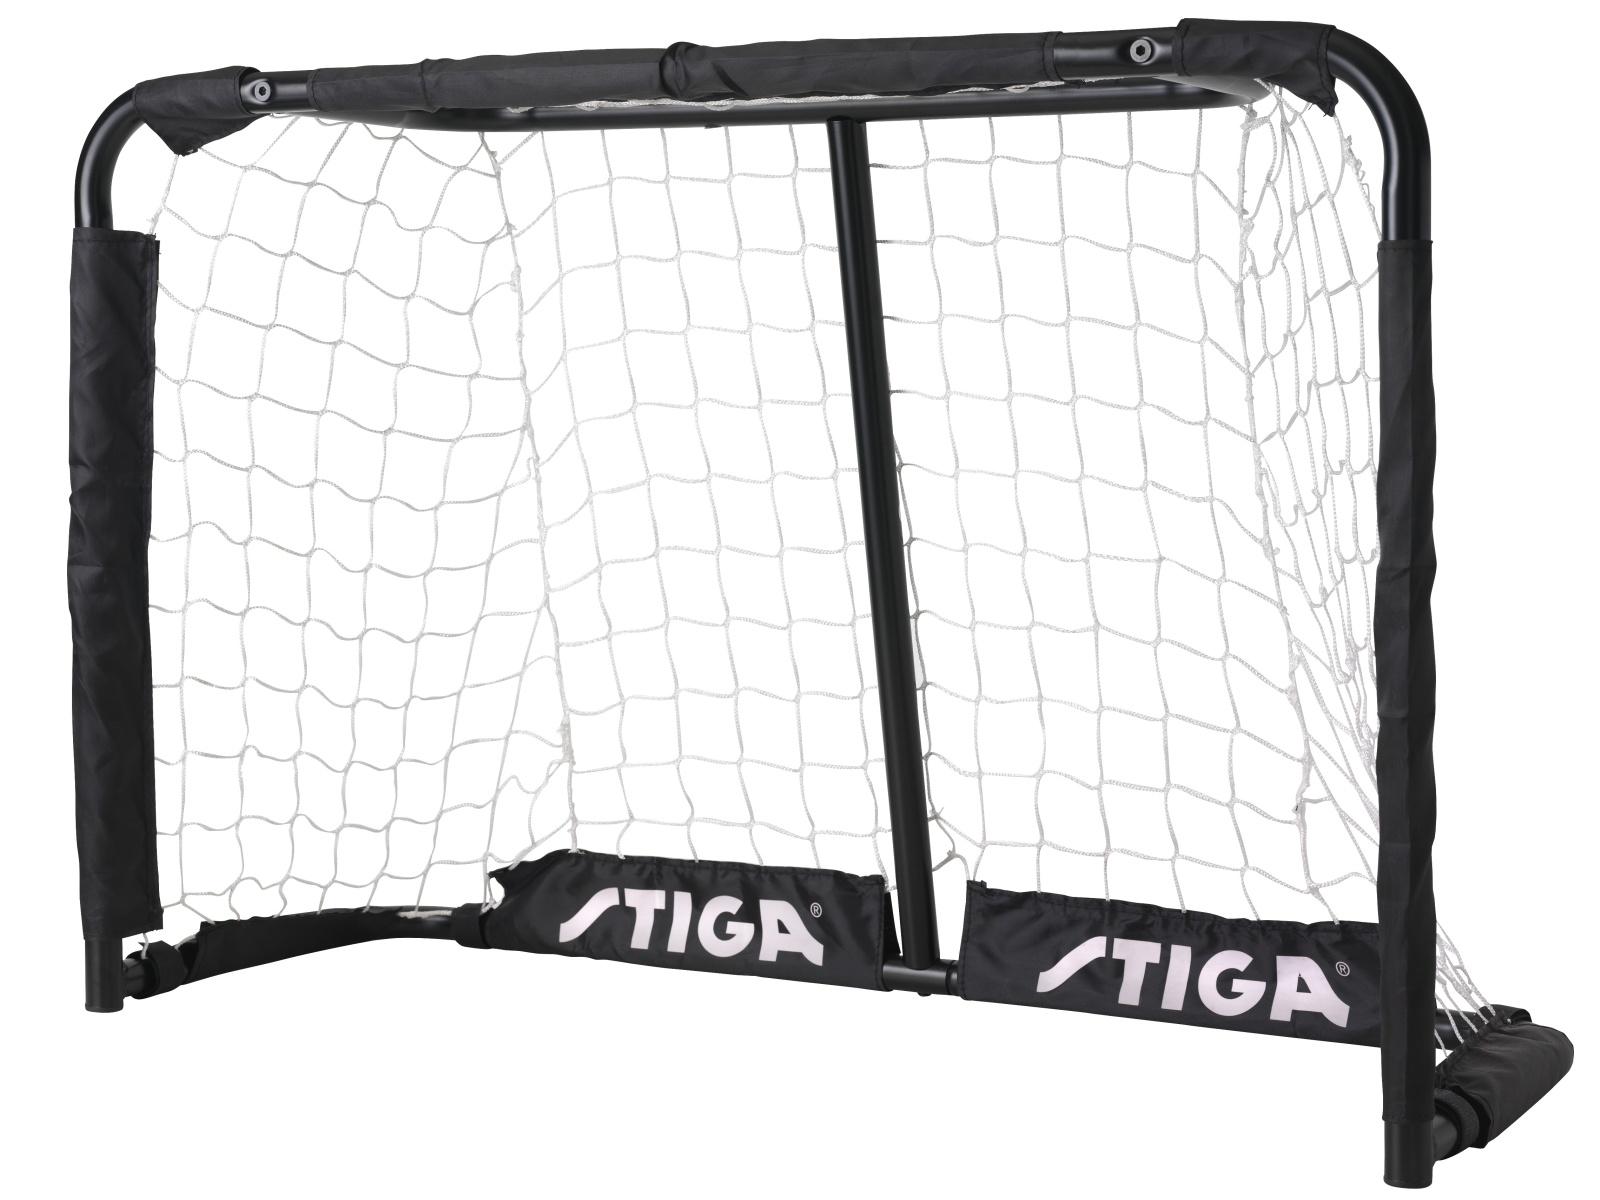 Branka STIGA Goal Pro 79 x 54 cm